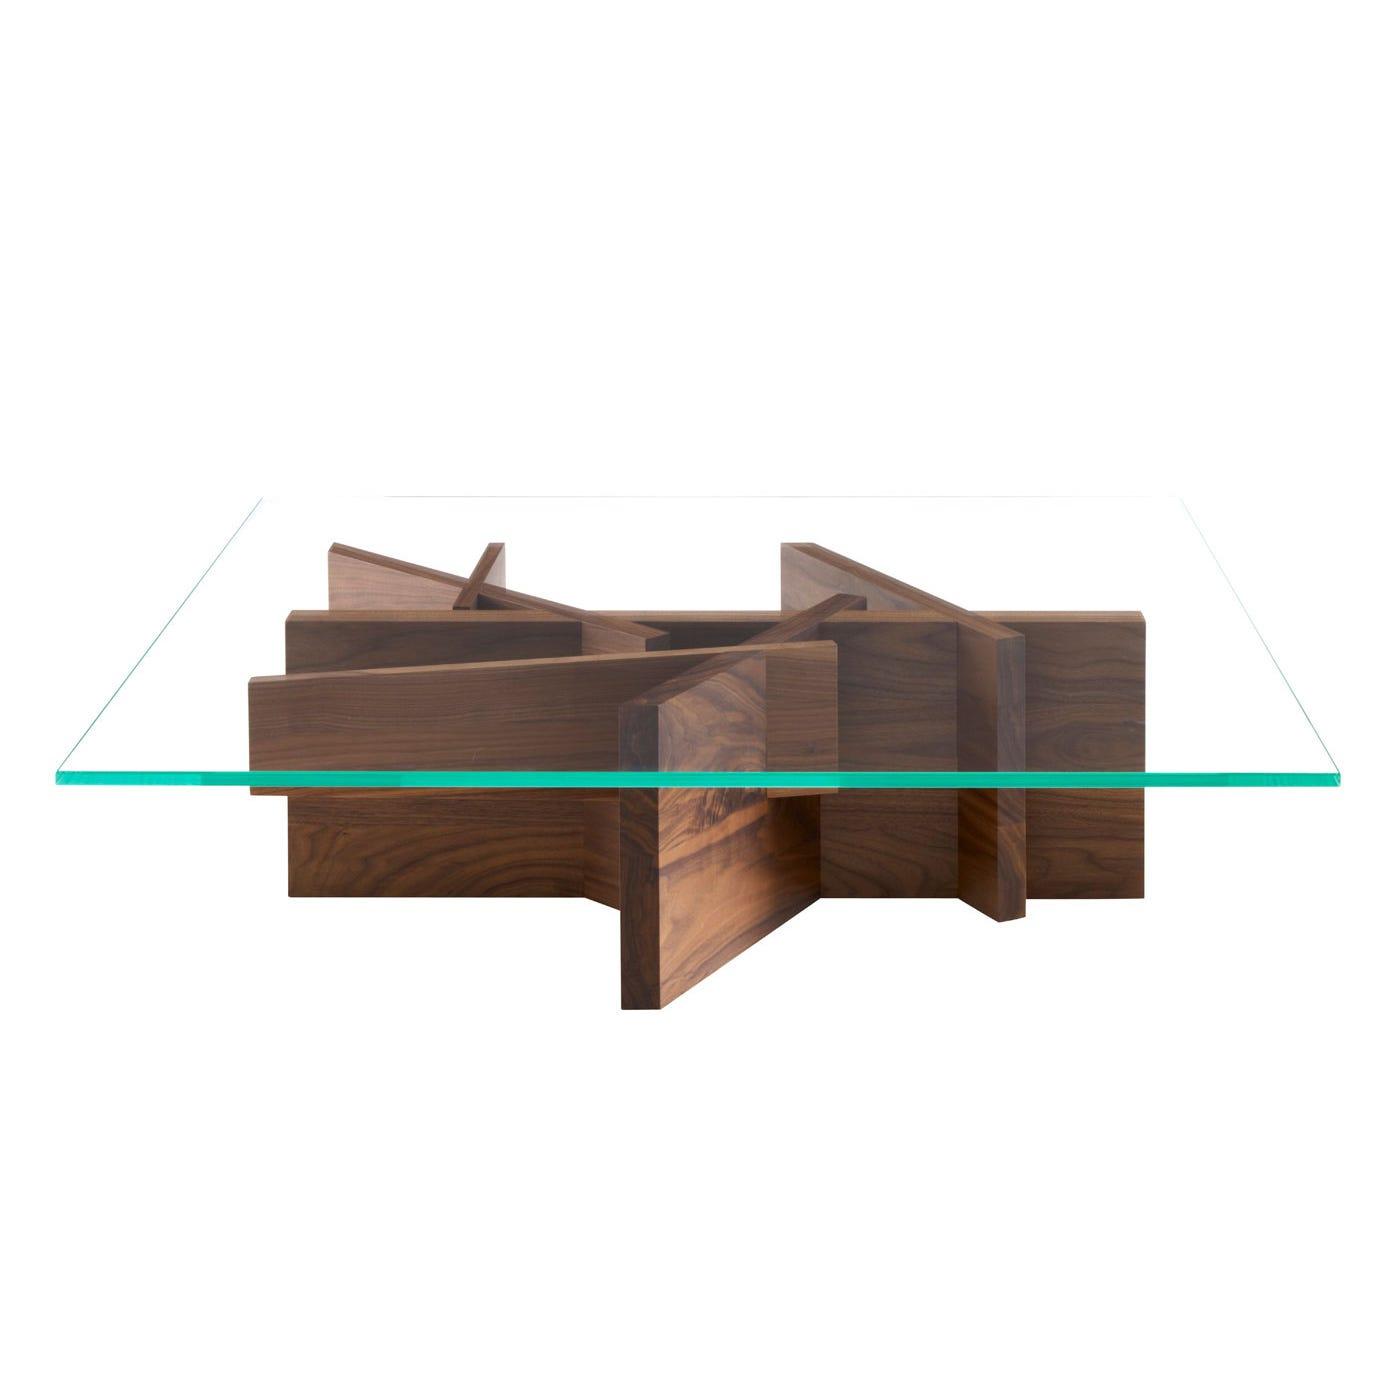 Ashera Natural Oak Rectangular Low Table - Warehouse Sale